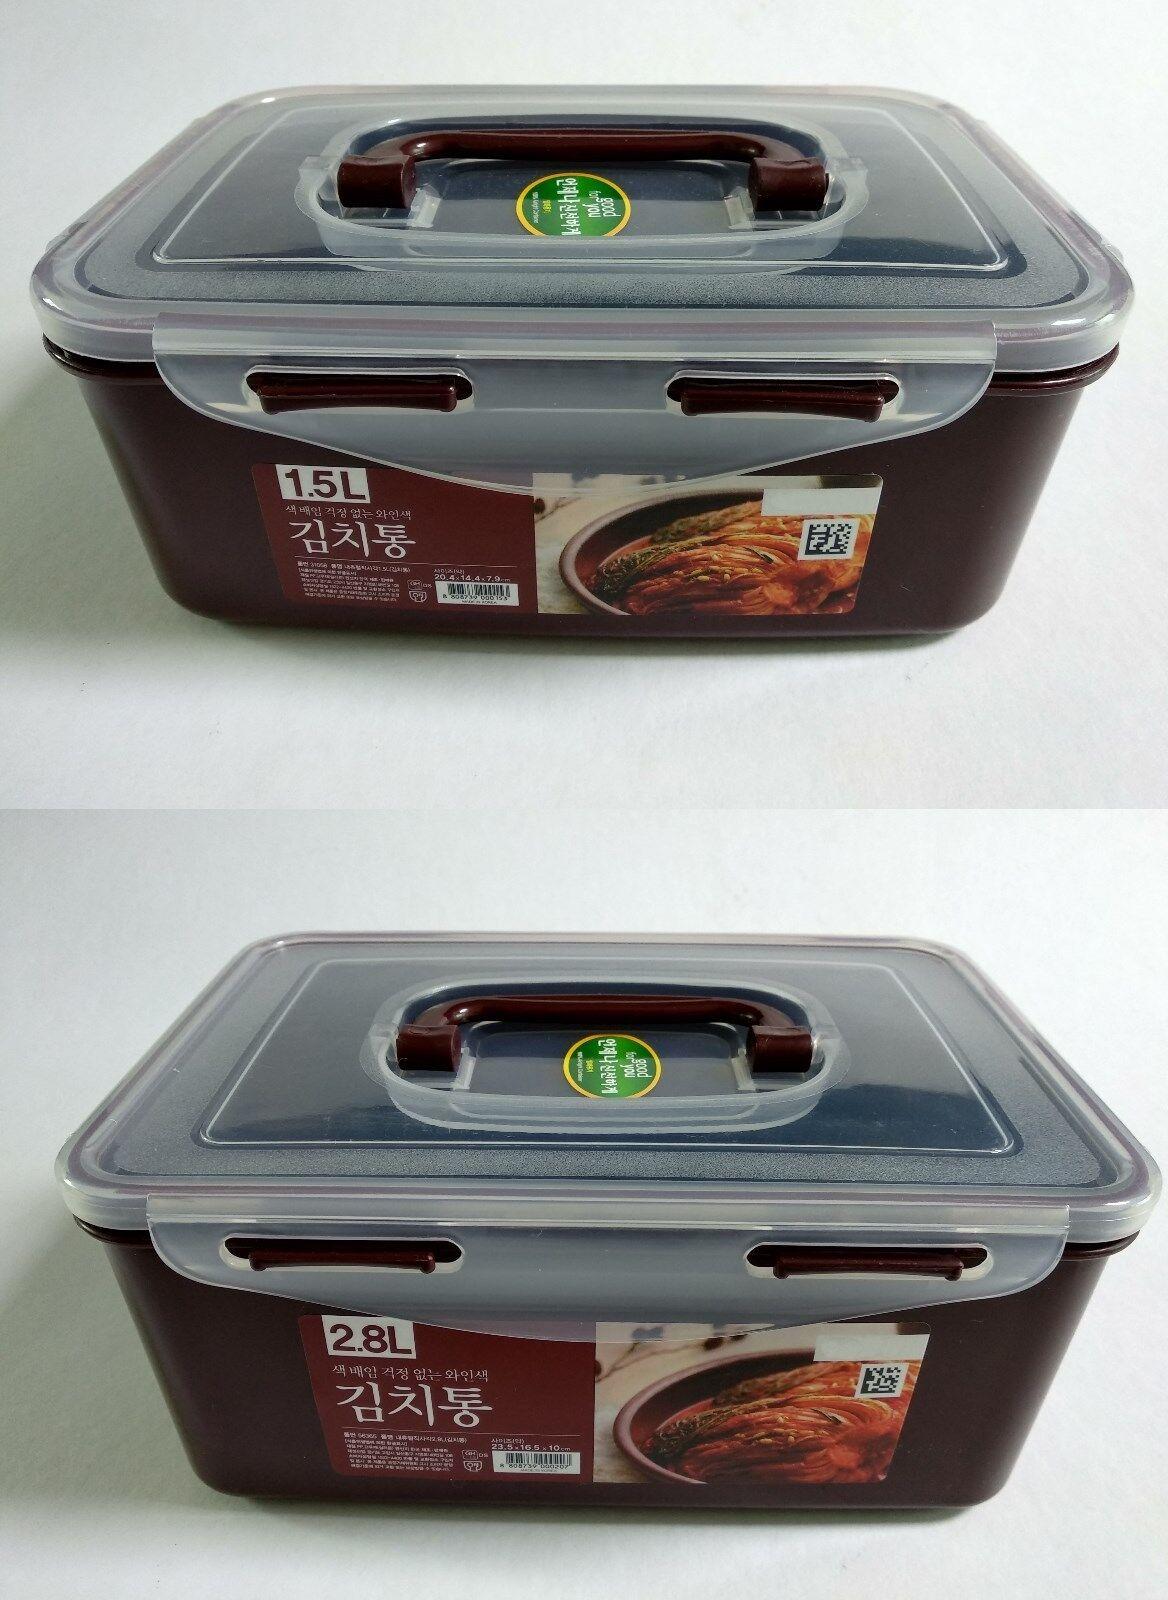 Korean Natural Wine Color Kimchi Food Storage Container 1.5L